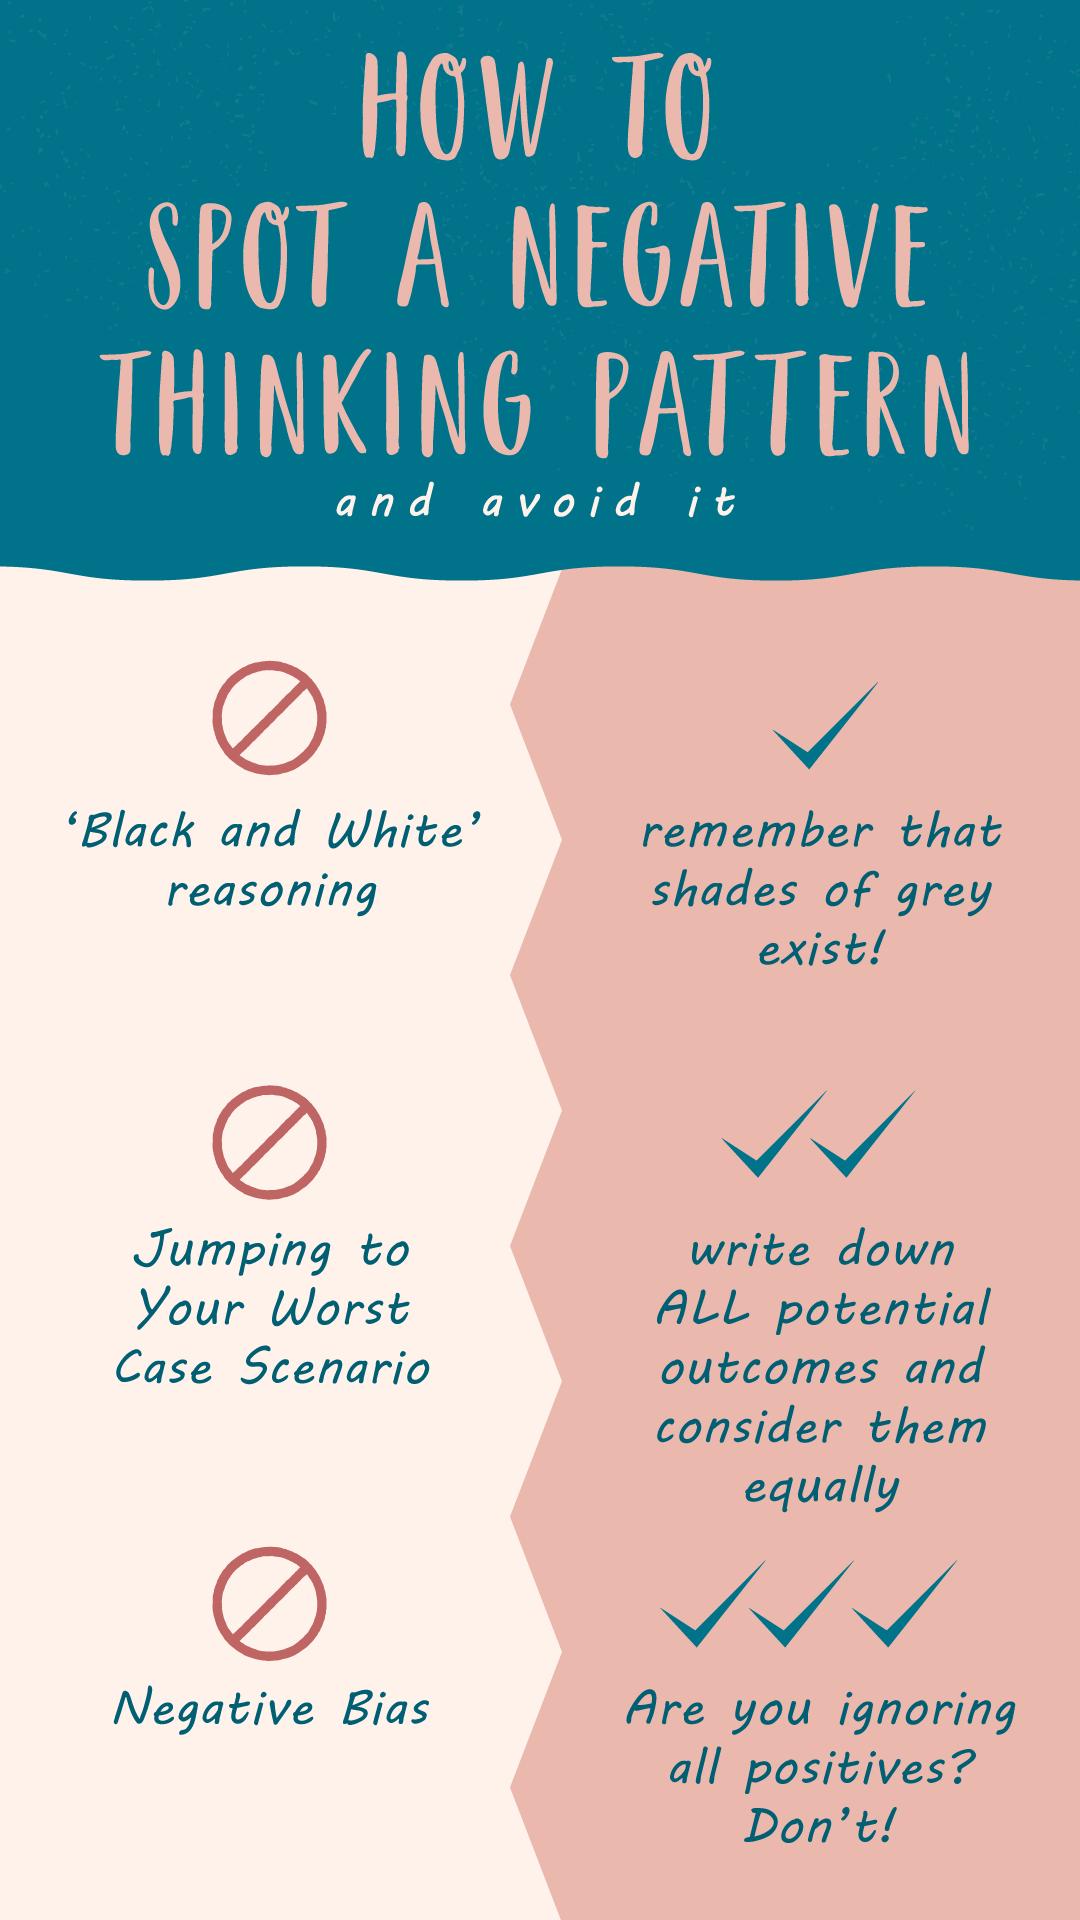 Stop that Negative Thinking Pattern